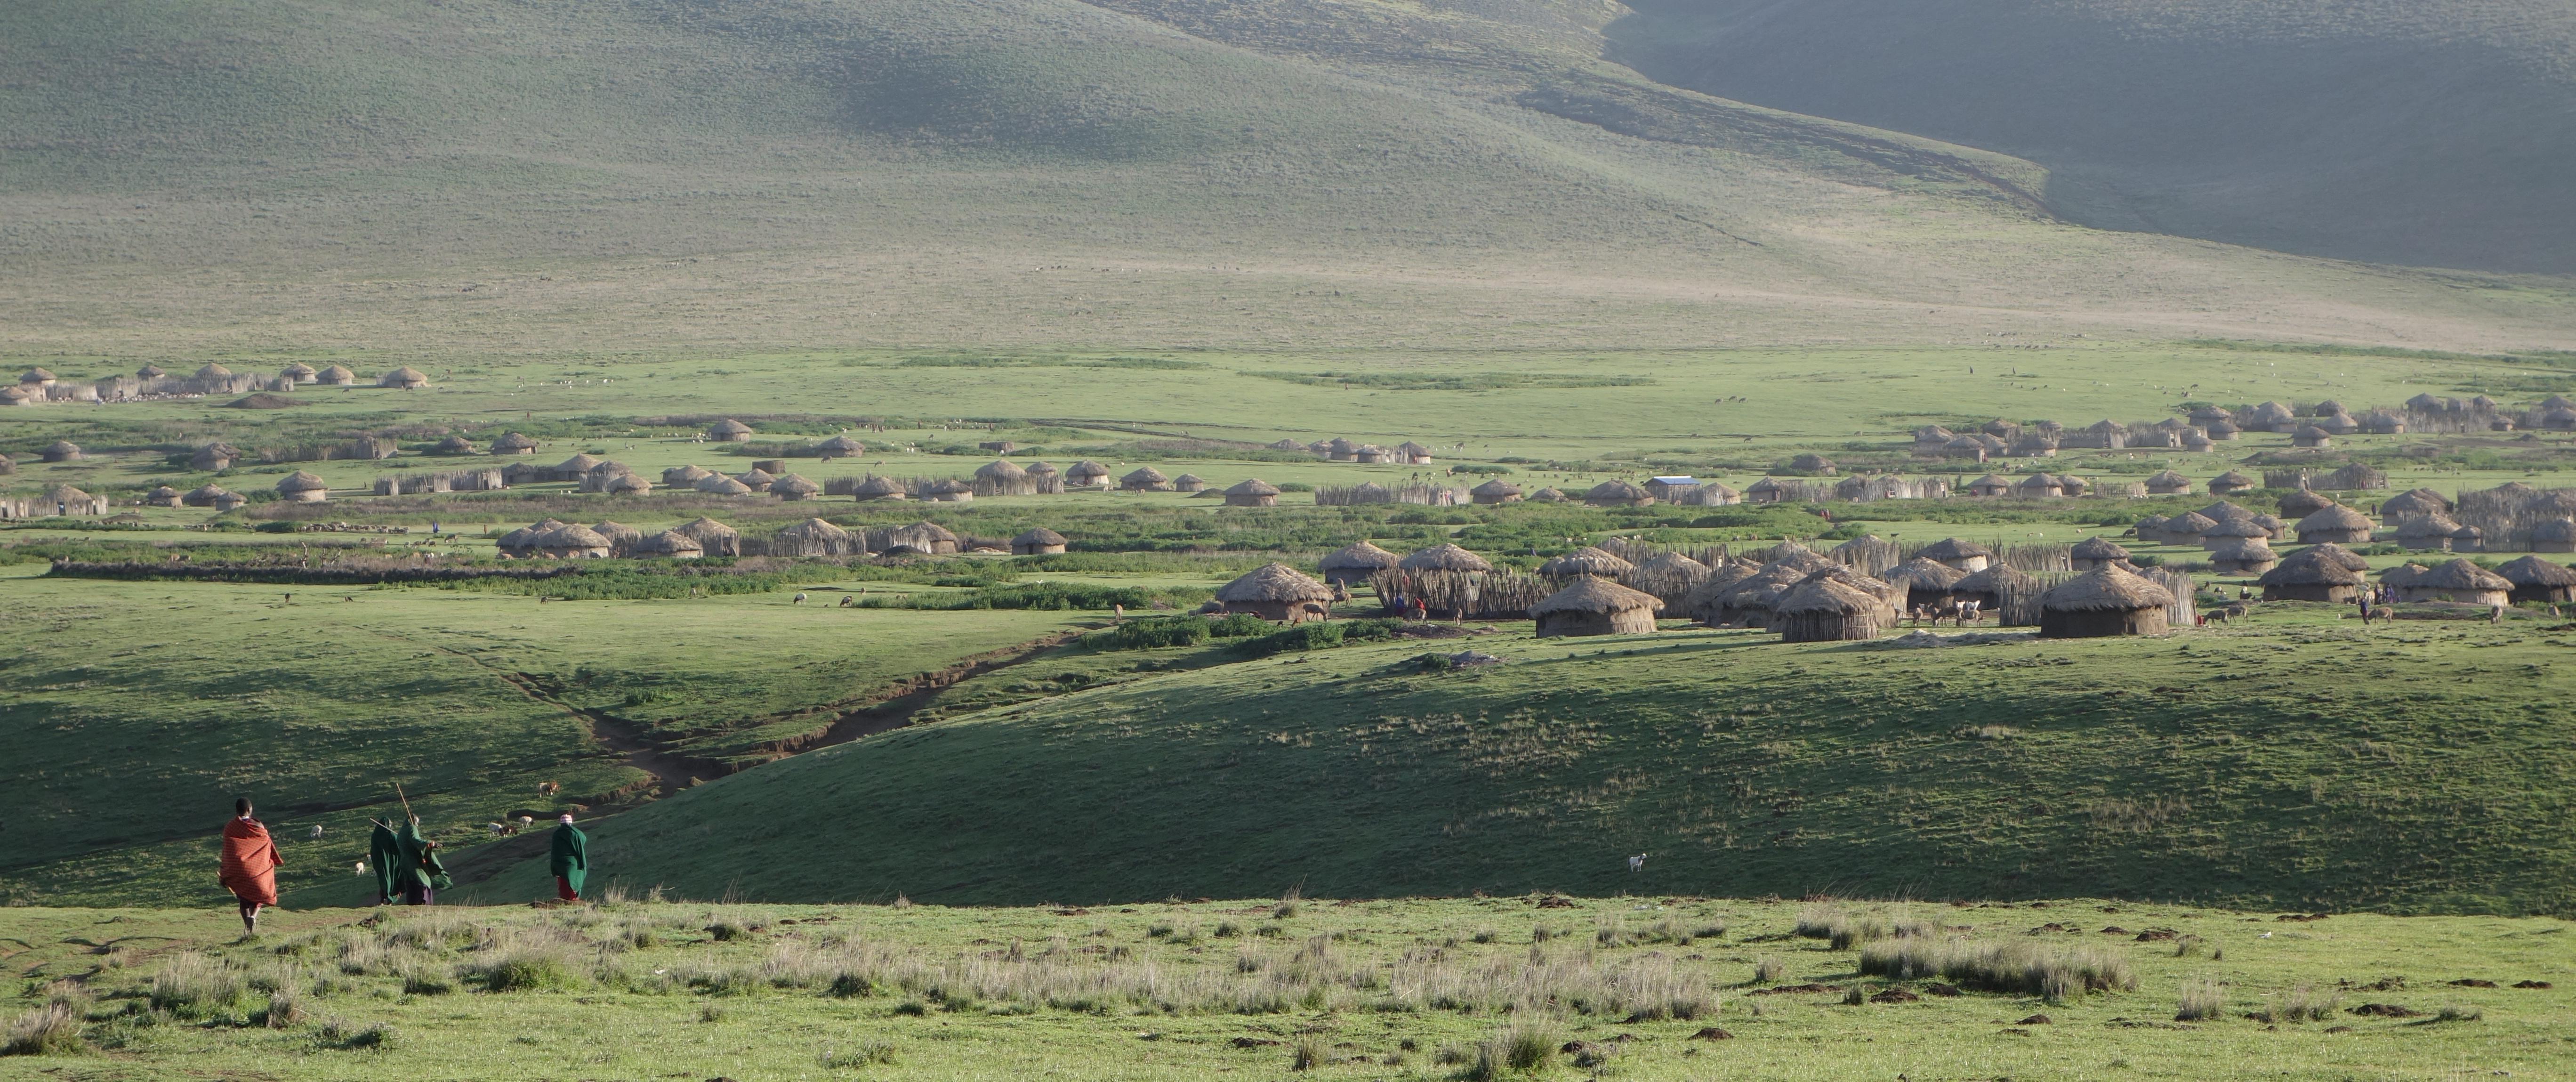 Ngorongoro Tanzania